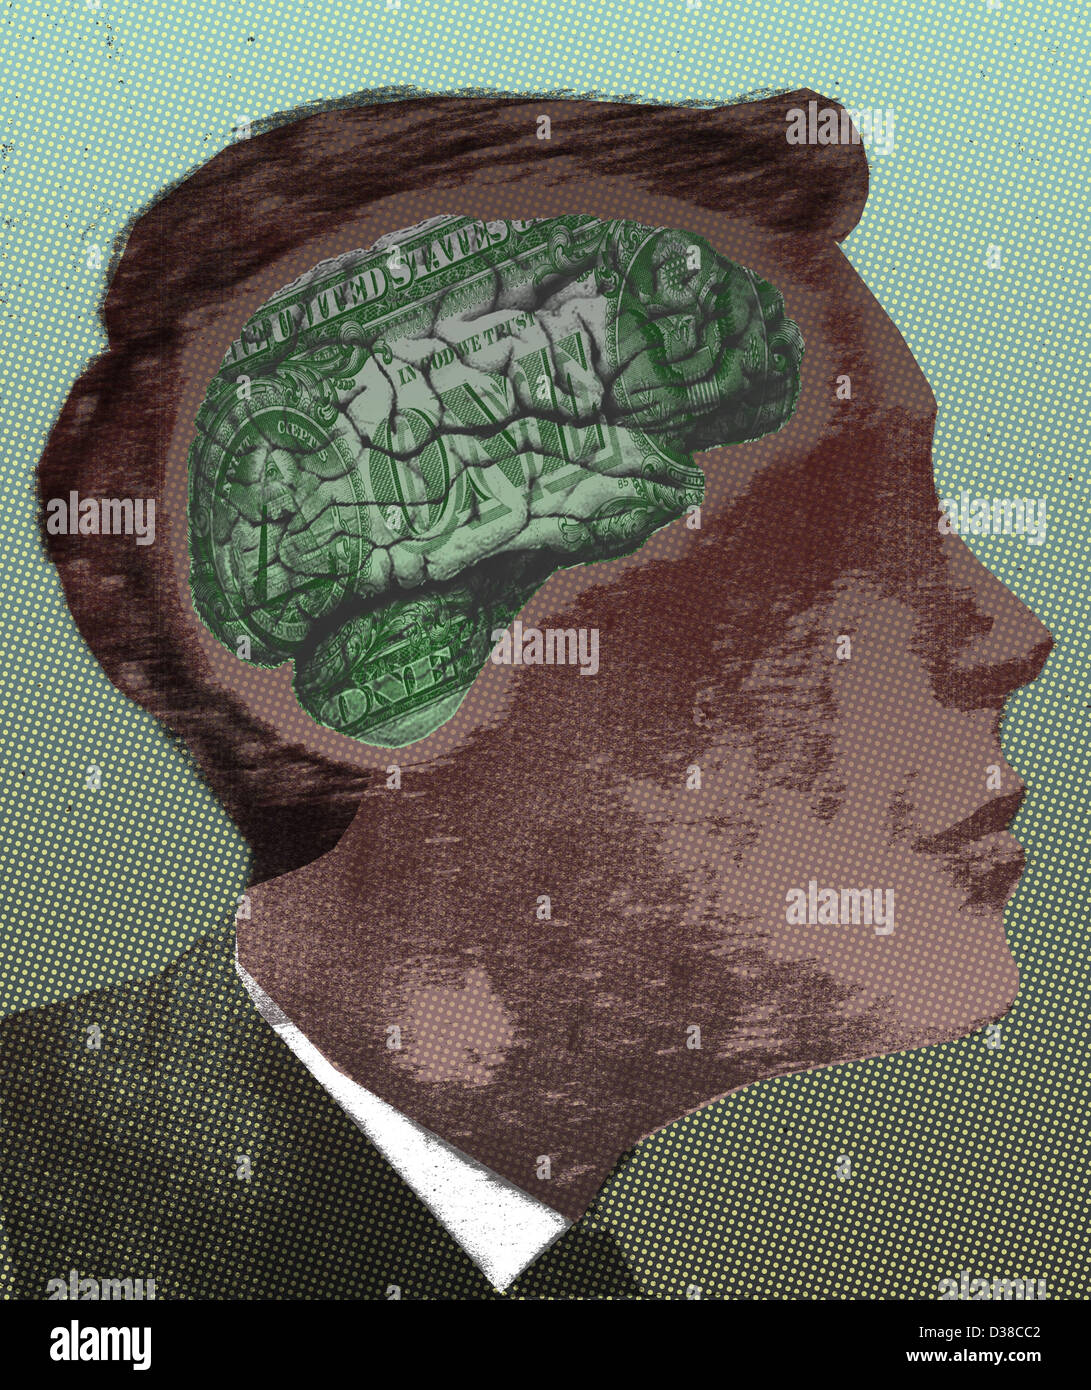 Illustrative image of businessman with money minded brain representing economical thinking - Stock Image